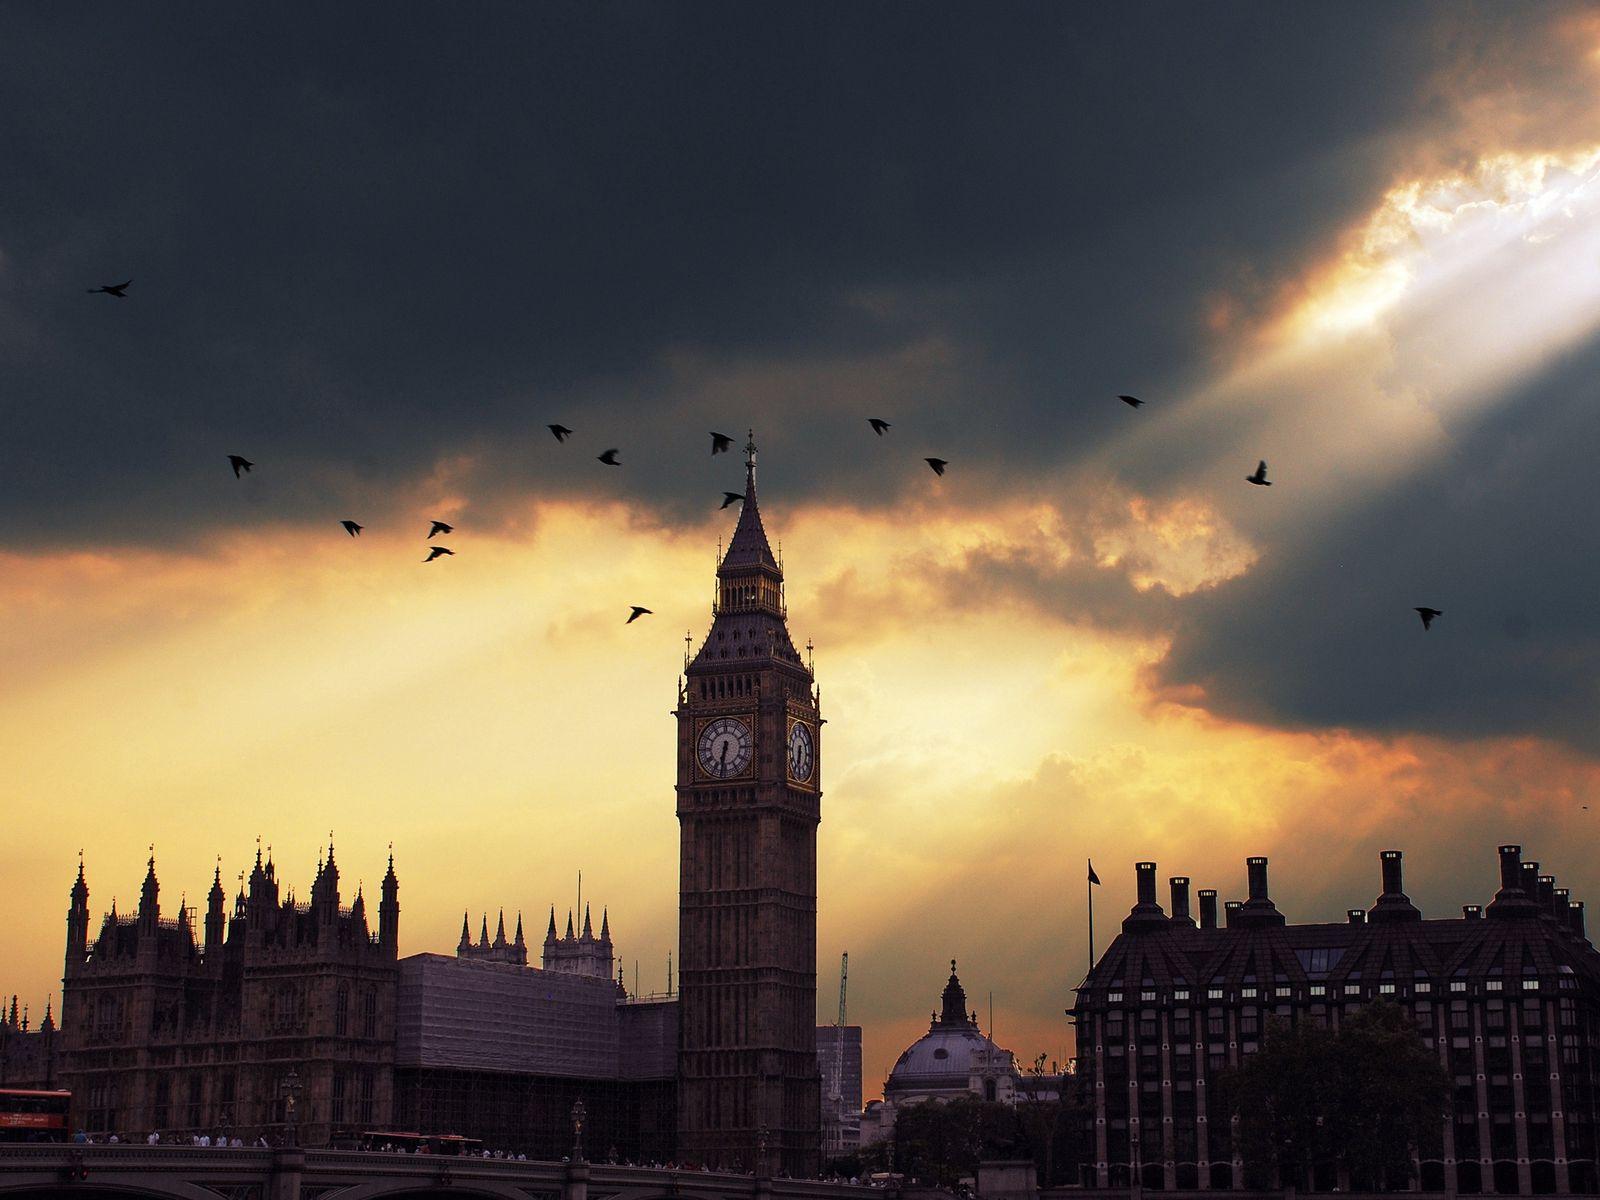 1600x1200 Wallpaper london, big ben, sunset, shadow, sky